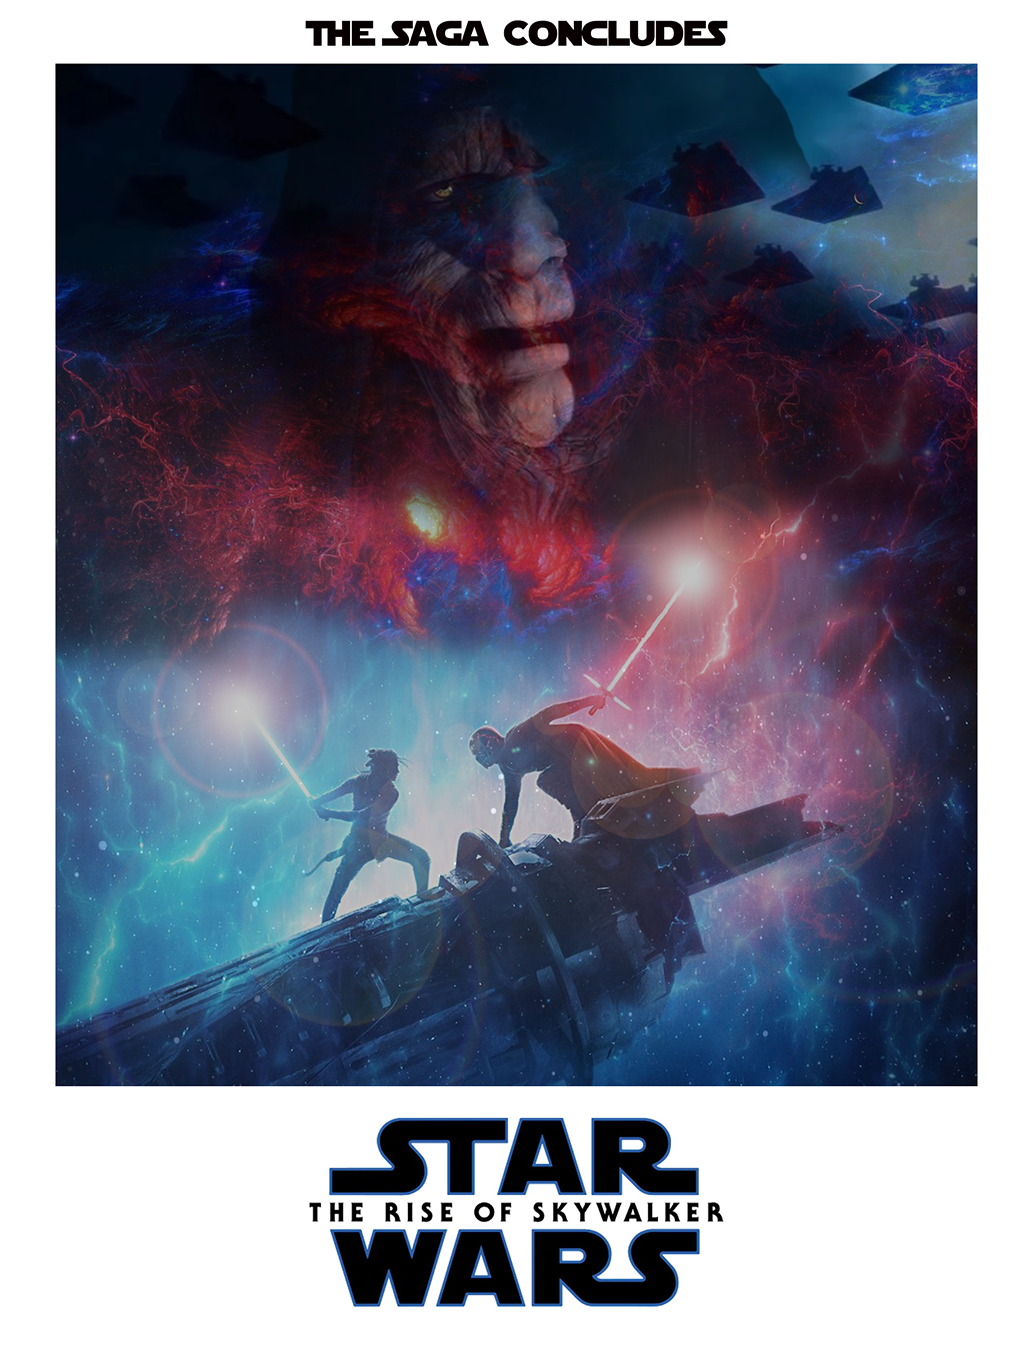 star wars poster 2